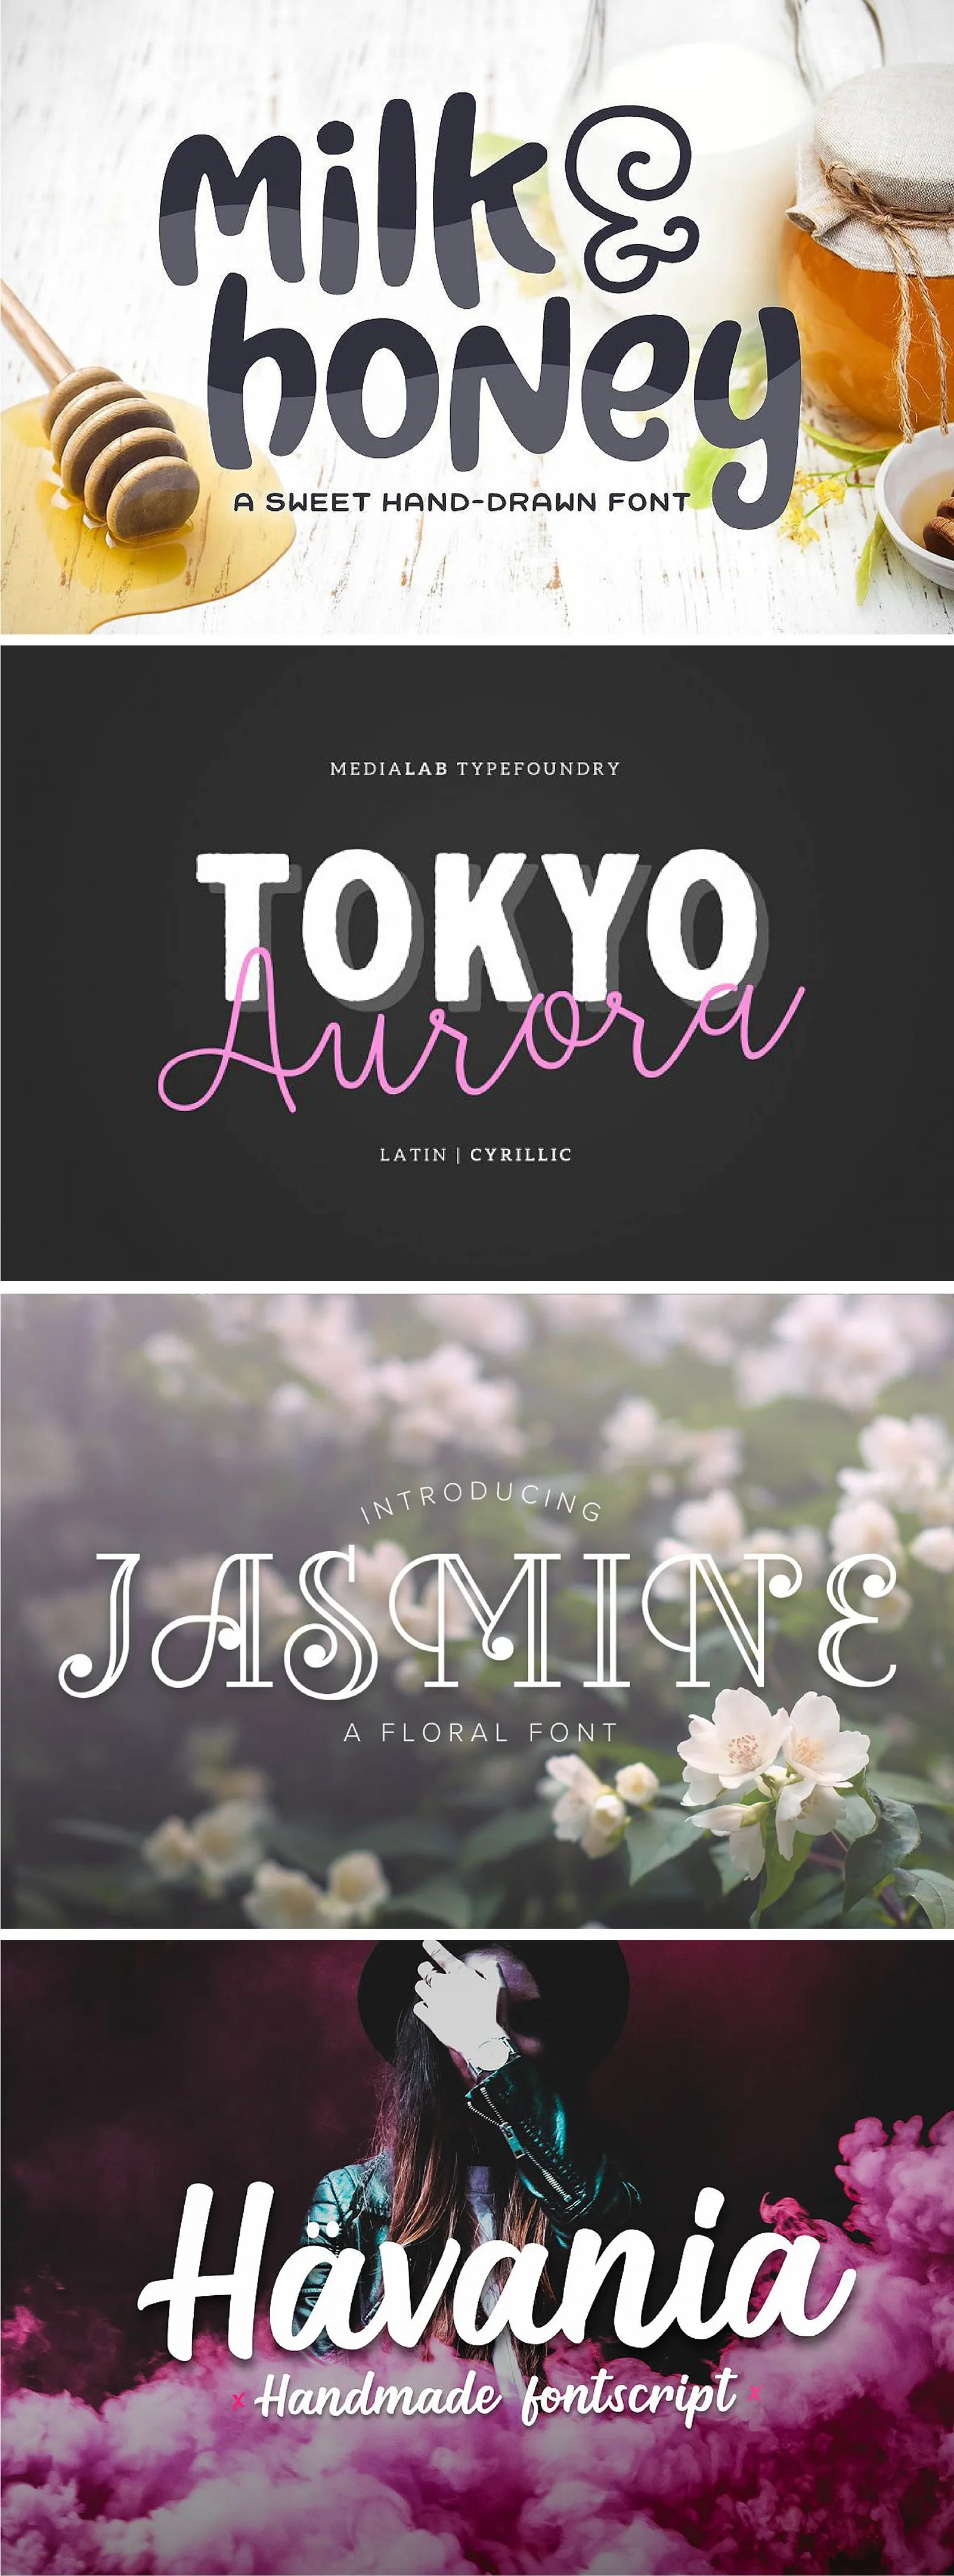 hand drawn, script, bold, floral font typefaces